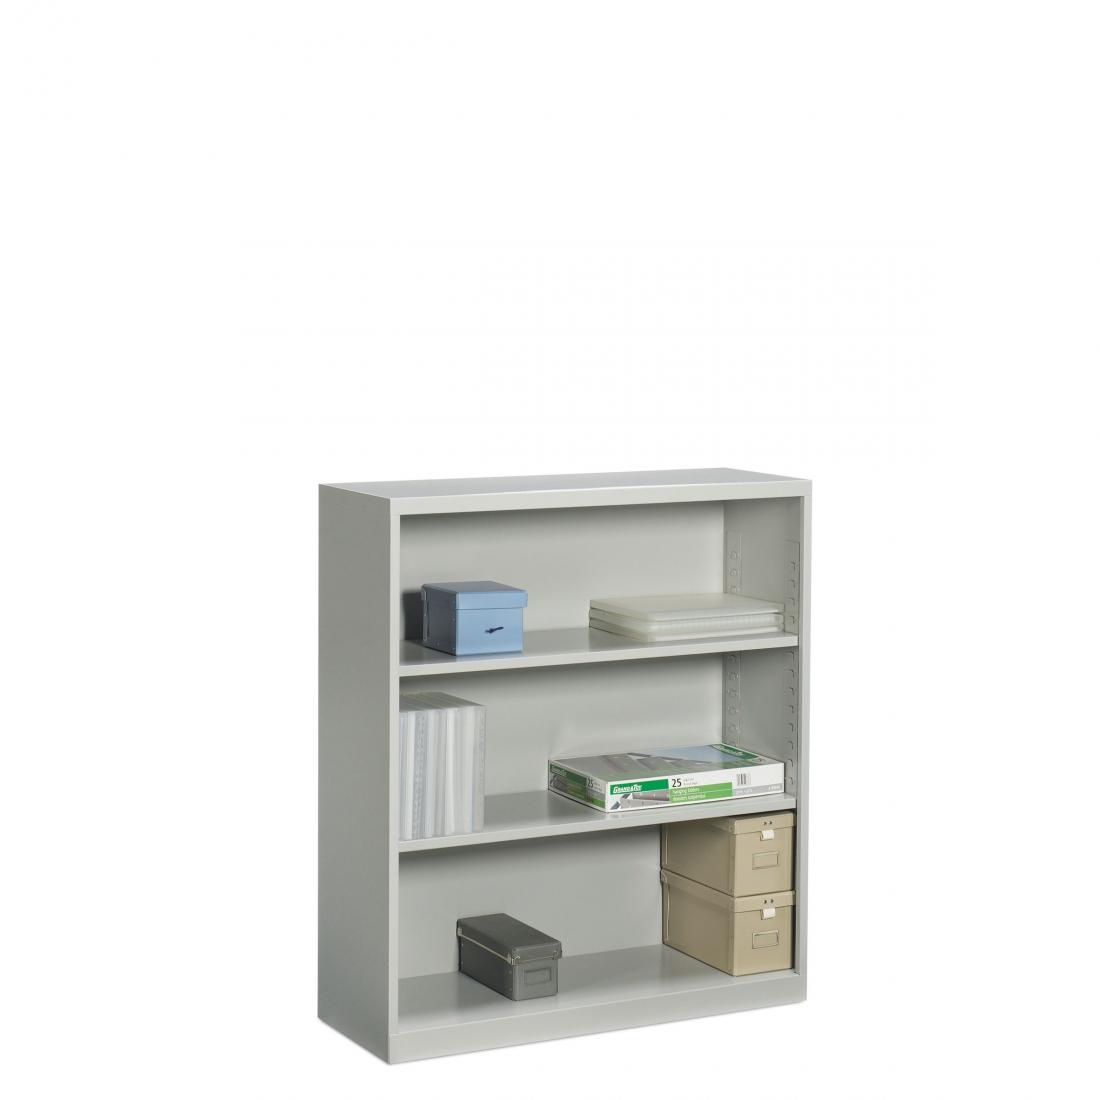 3 Shelf Metal Bookcase